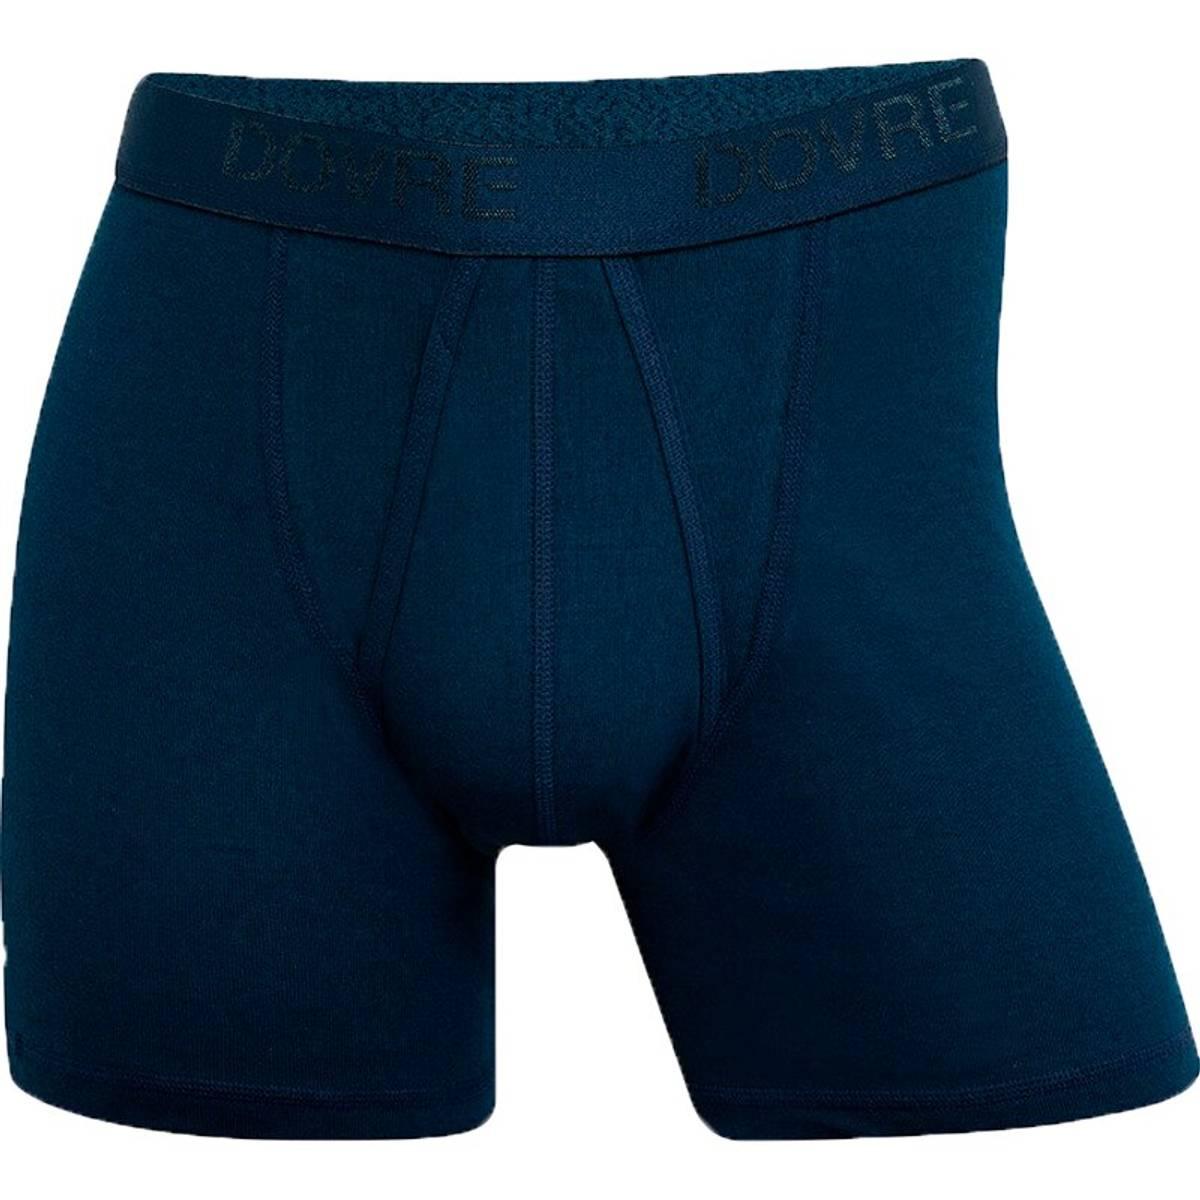 Dovre blå boxershorts, m/gylf